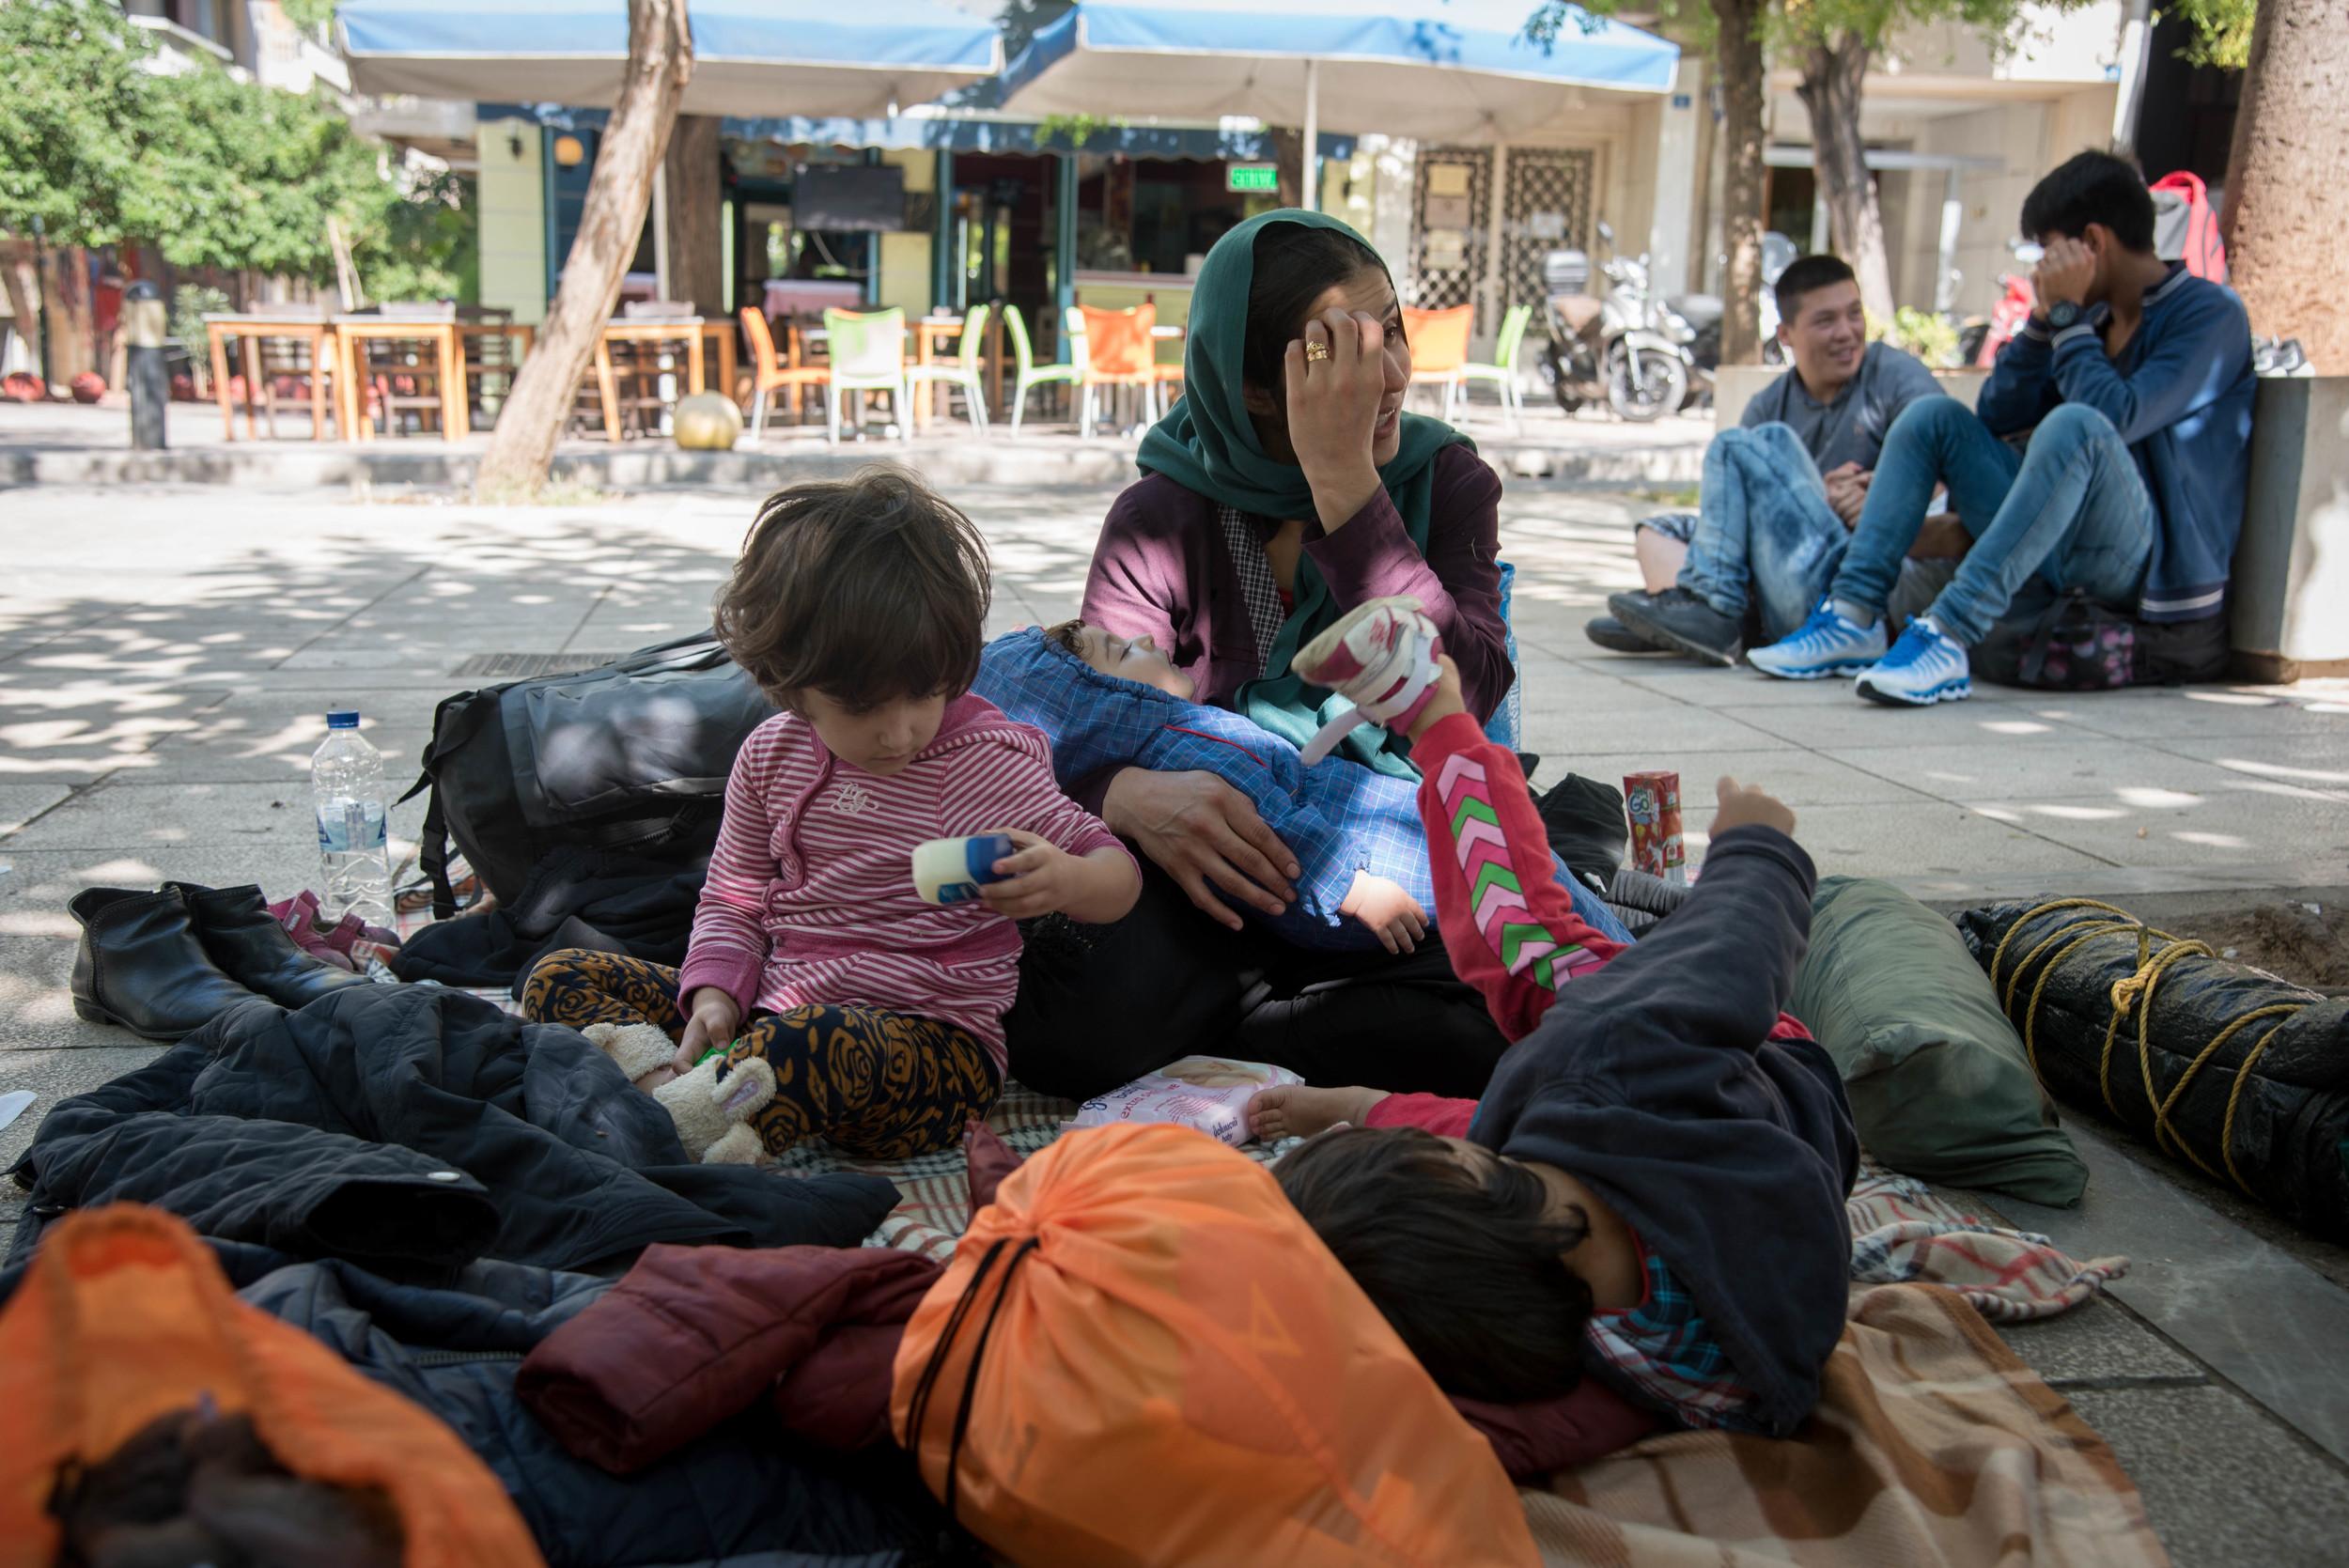 refugeescoloradocollege-8049.jpg